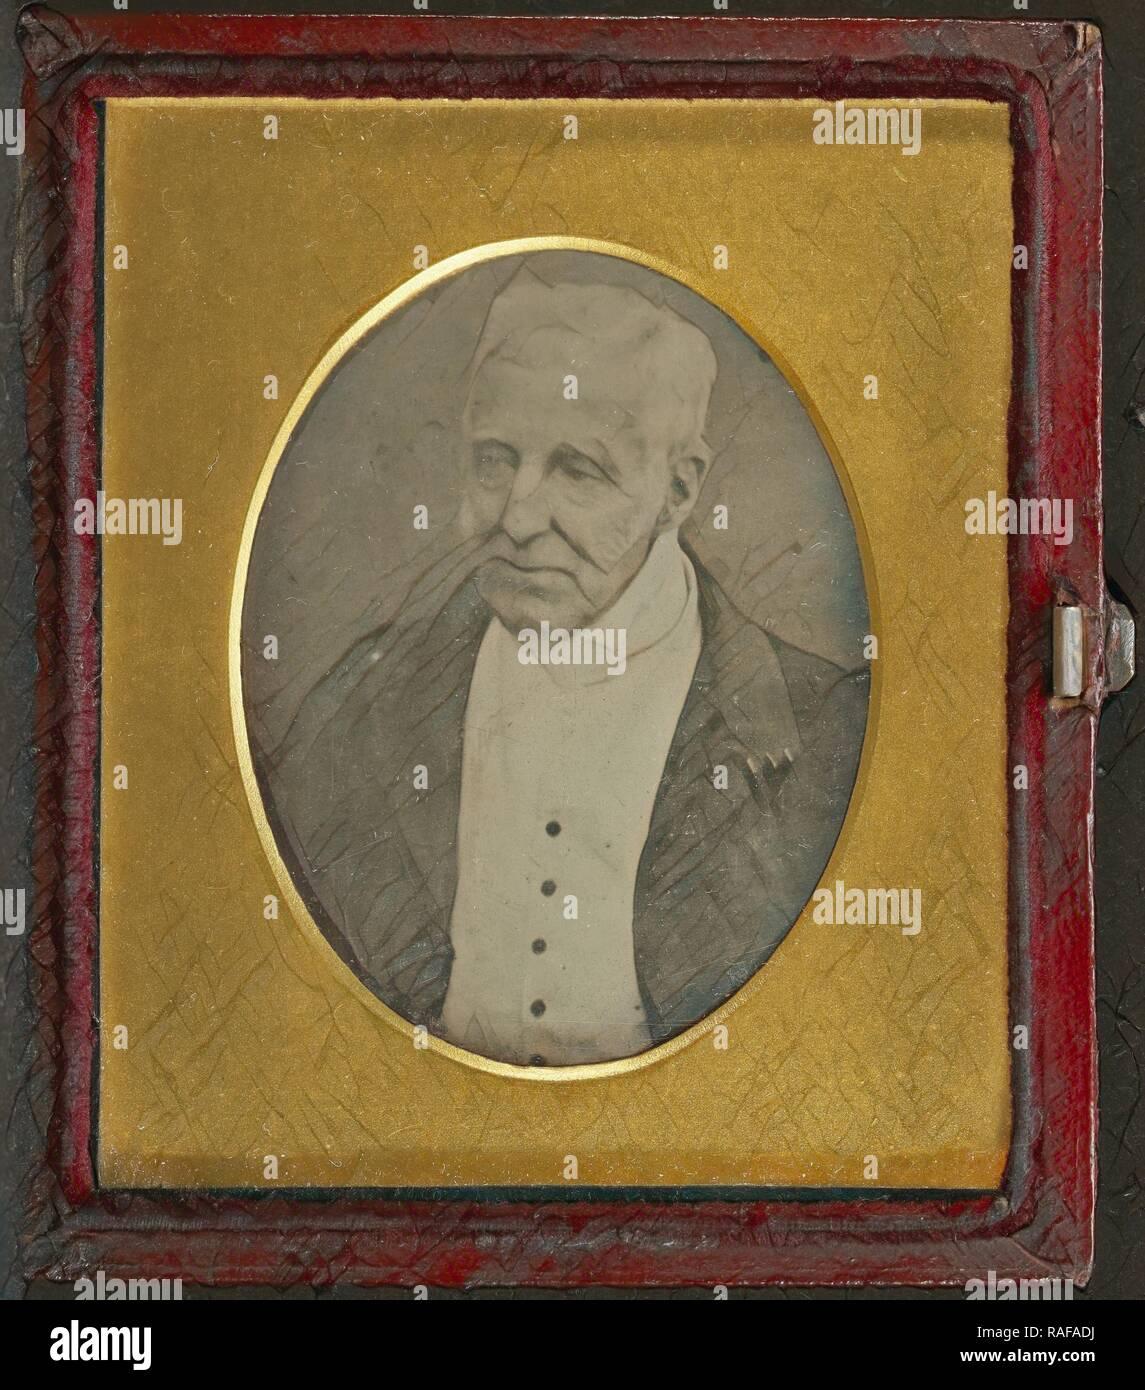 Portrait of the Duke of Wellington, Antoine Claudet (French, 1797 - 1867), May 1, 1844, Daguerreotype. Reimagined - Stock Image